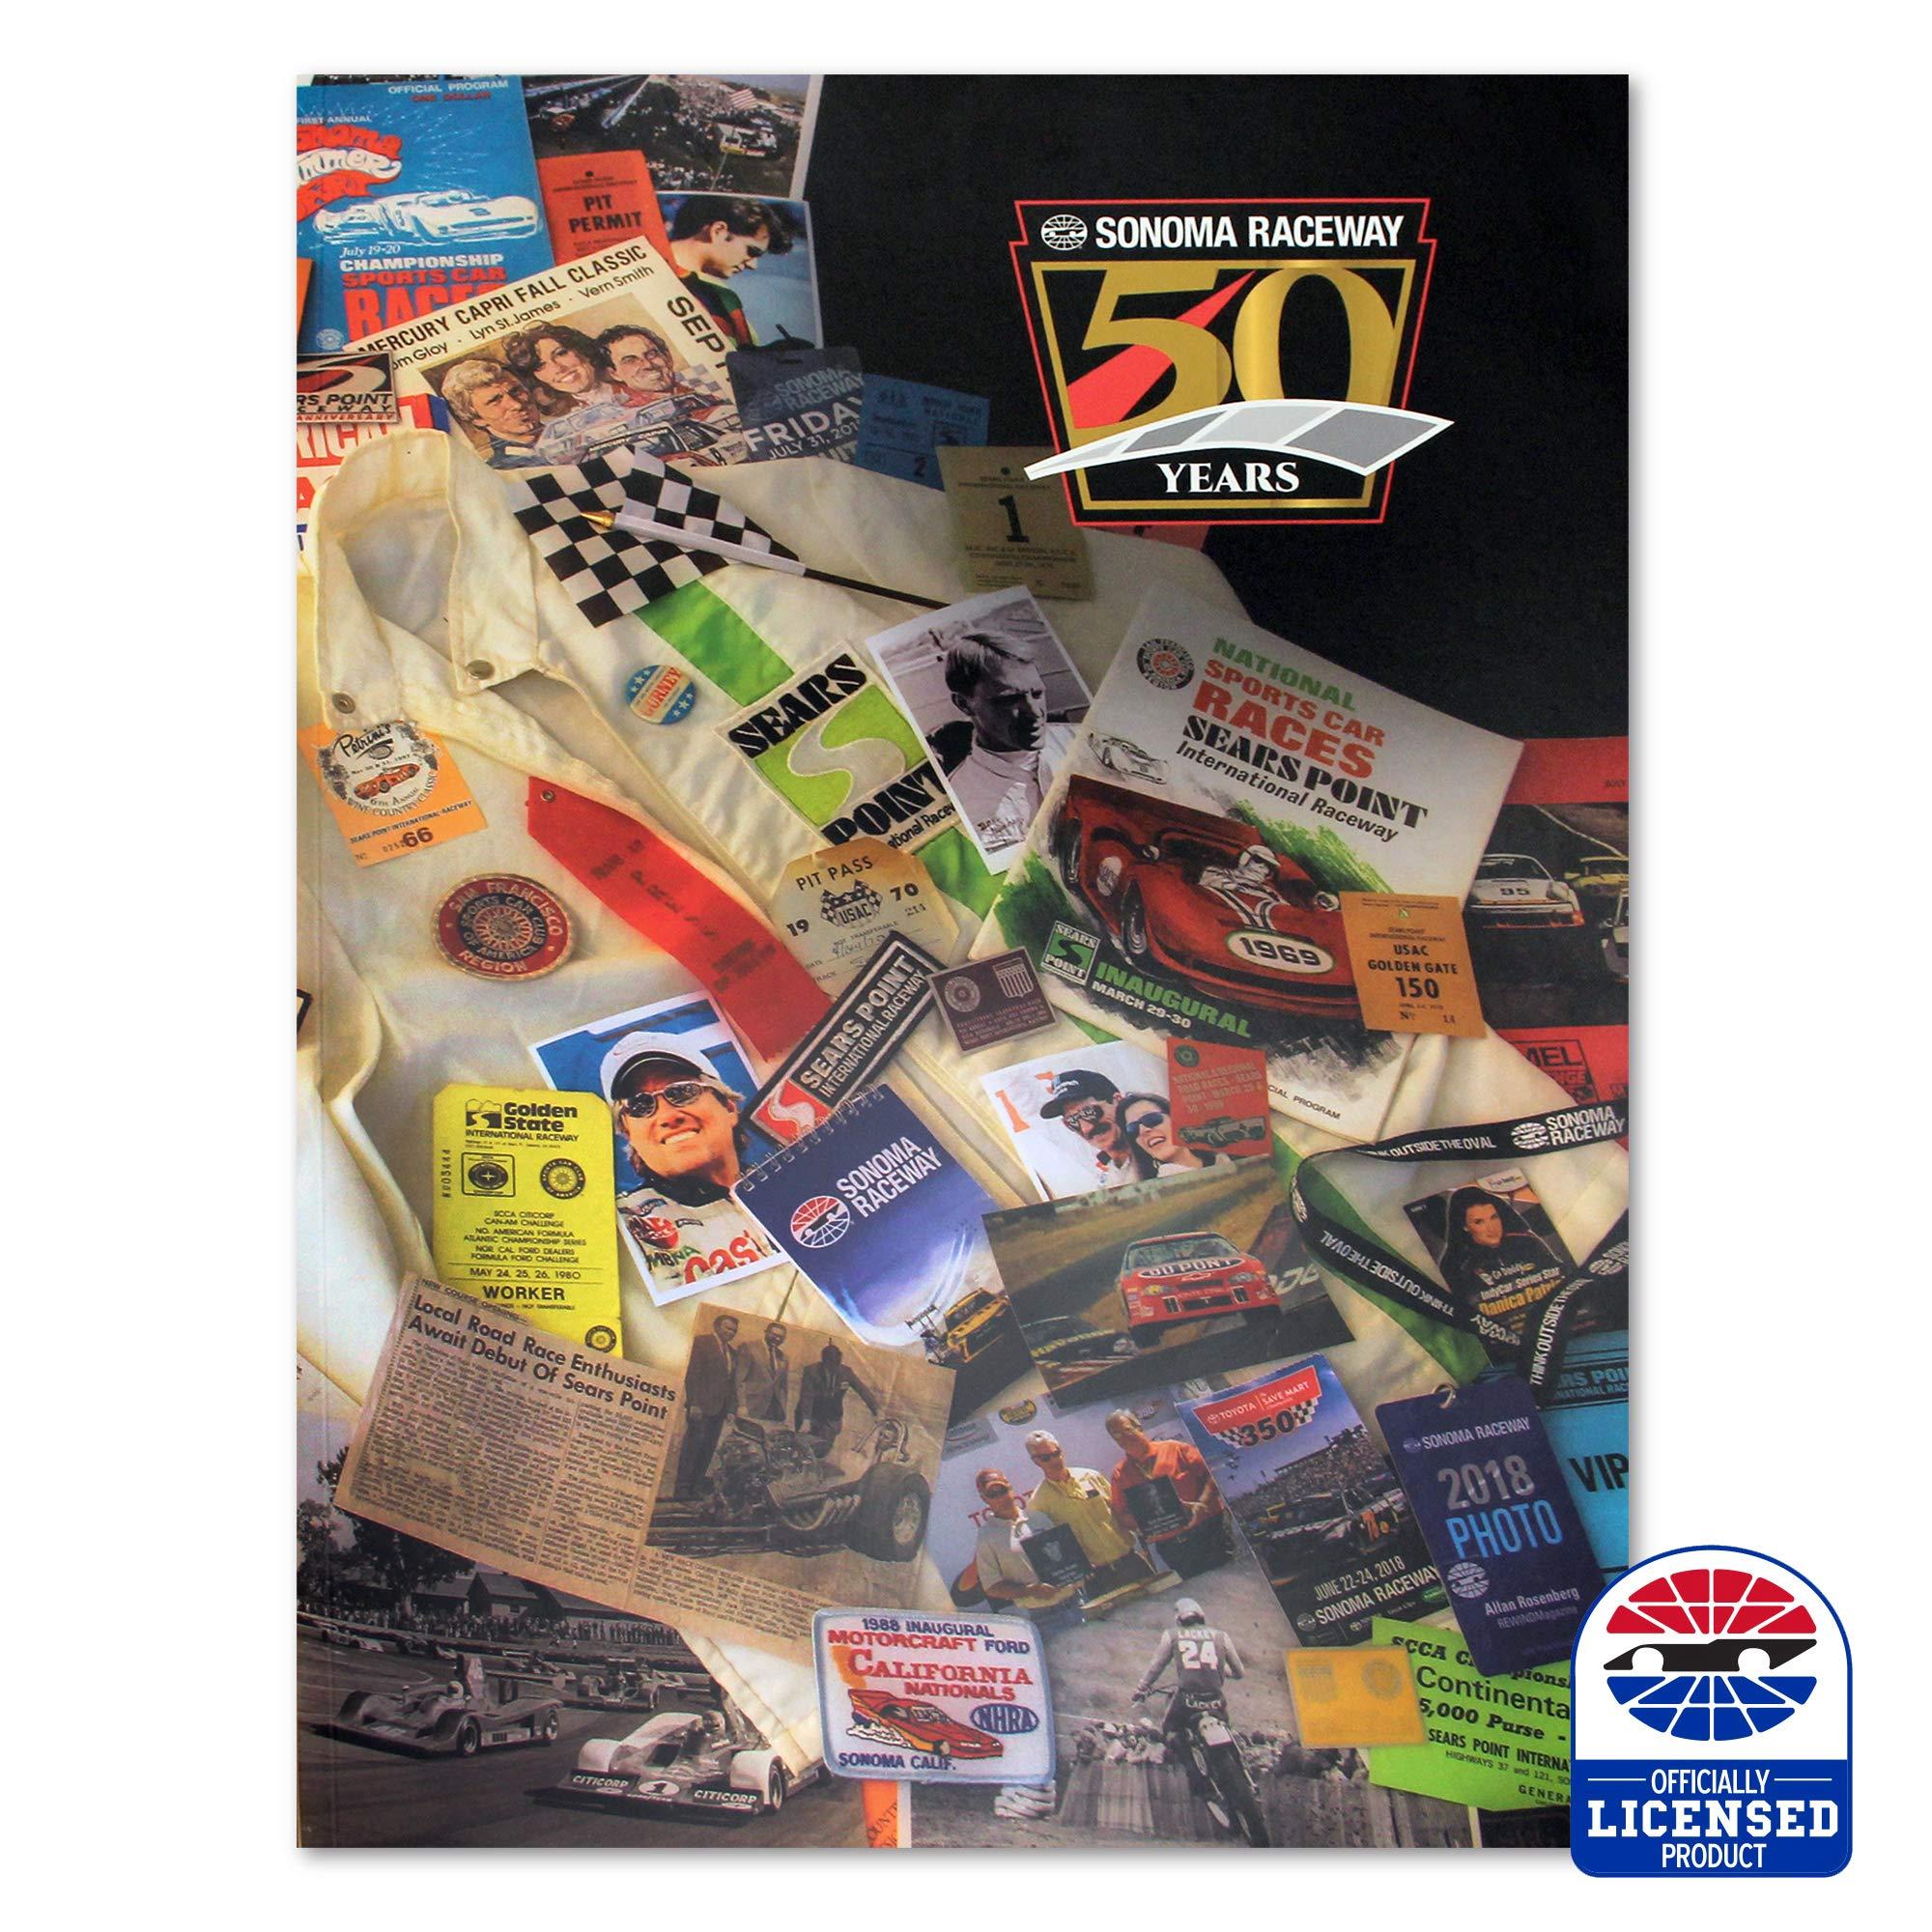 Sonoma Raceway 50th Anniversary Book